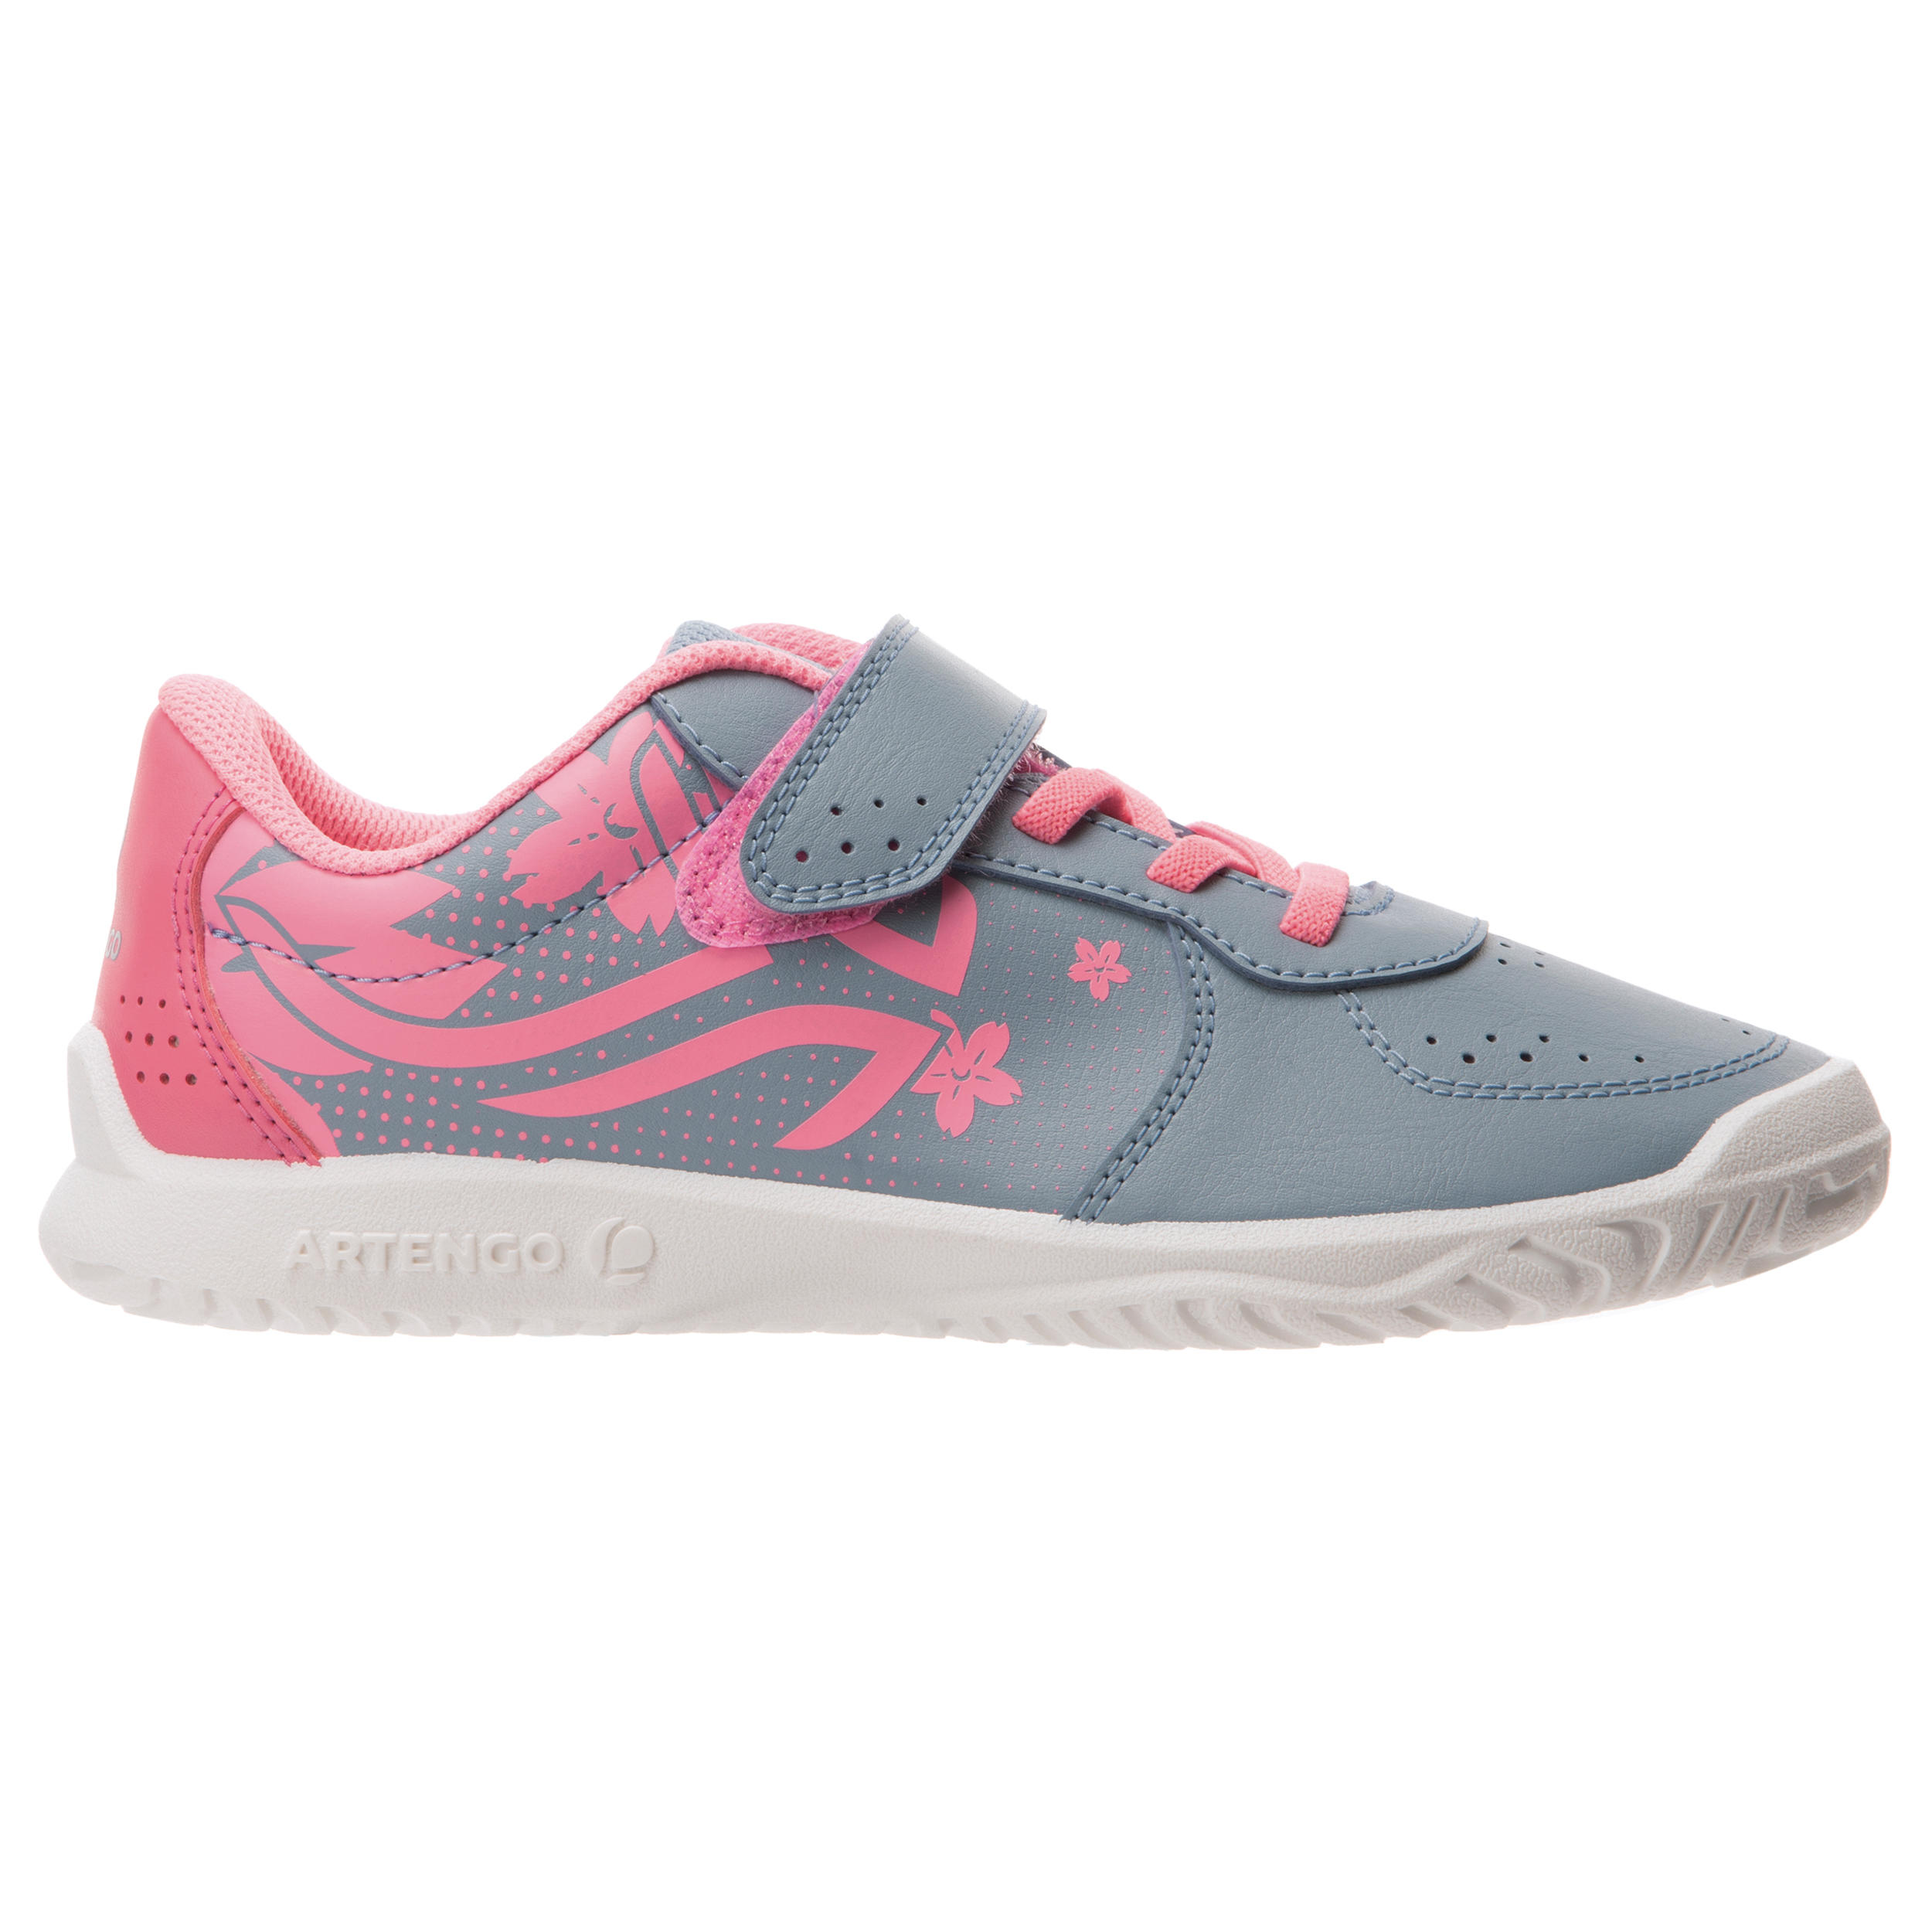 TS130 JR Kids' Tennis Shoes -